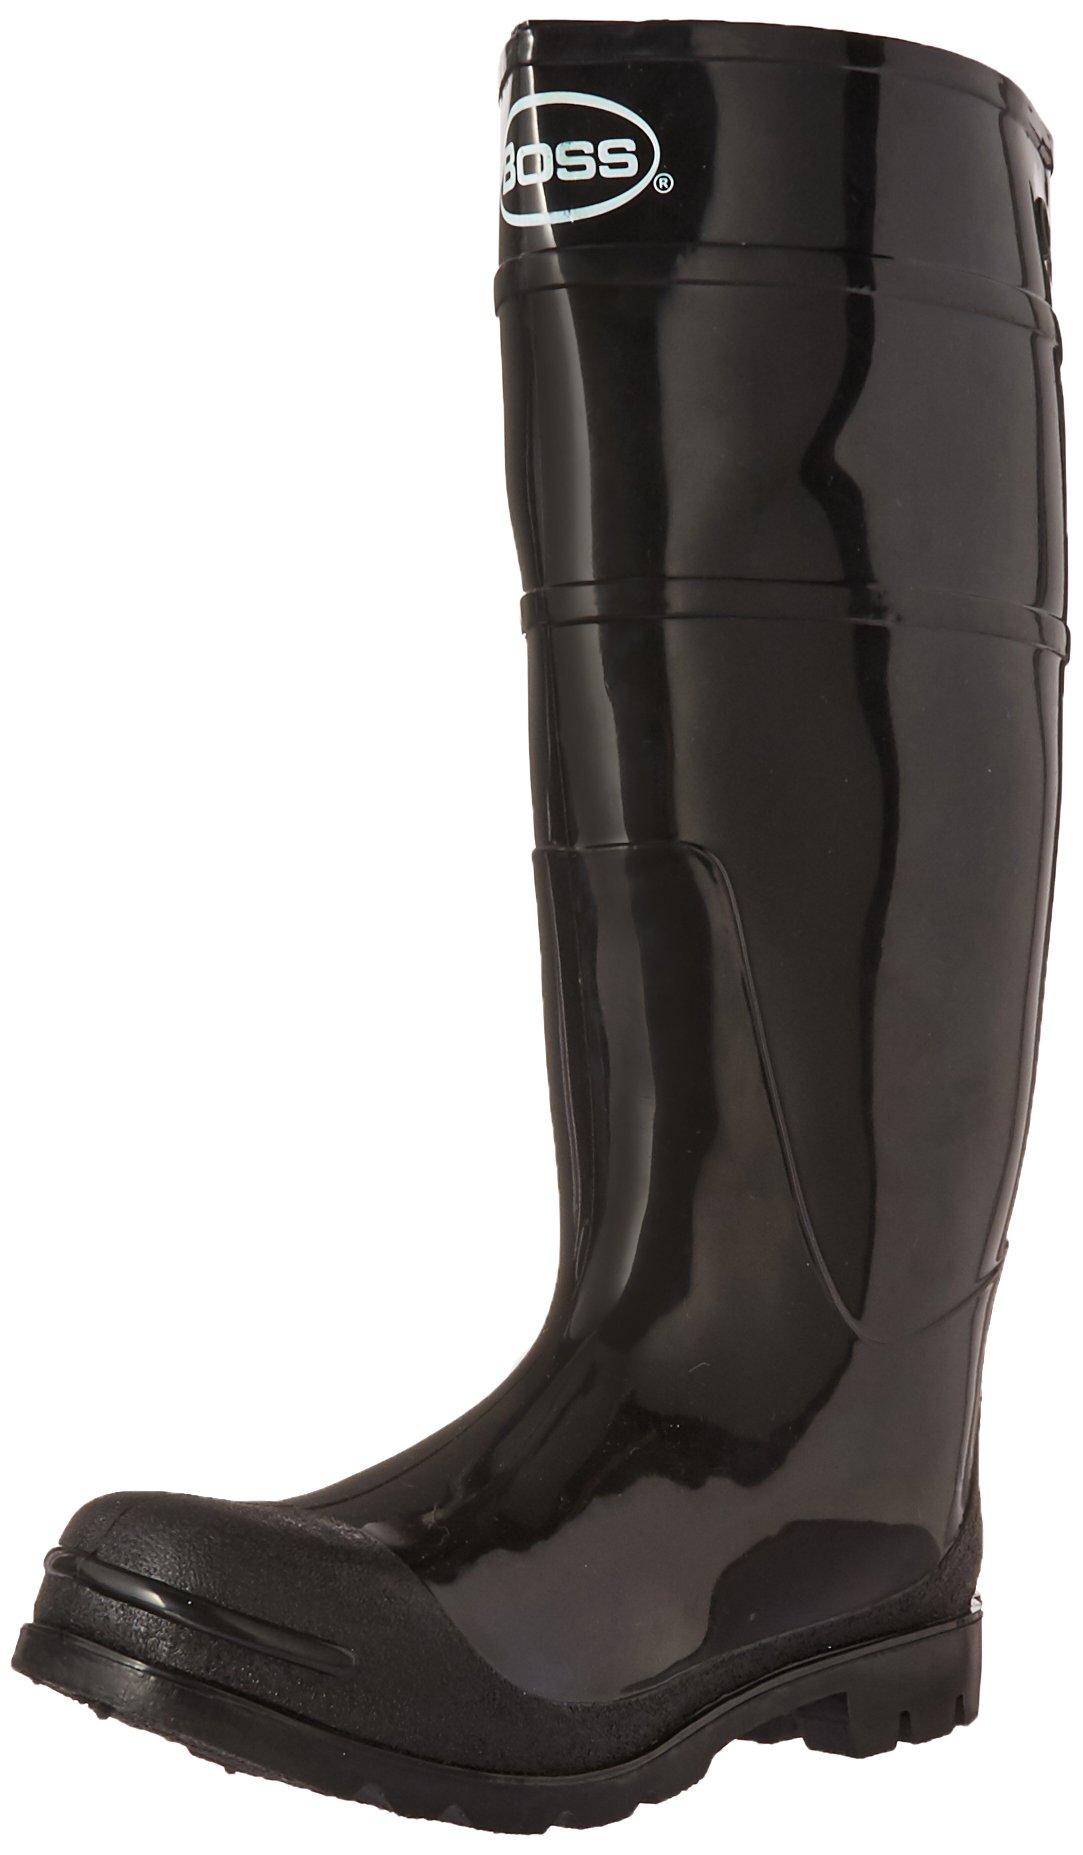 Boss 2KP200106 Men's Black Rubber Boots